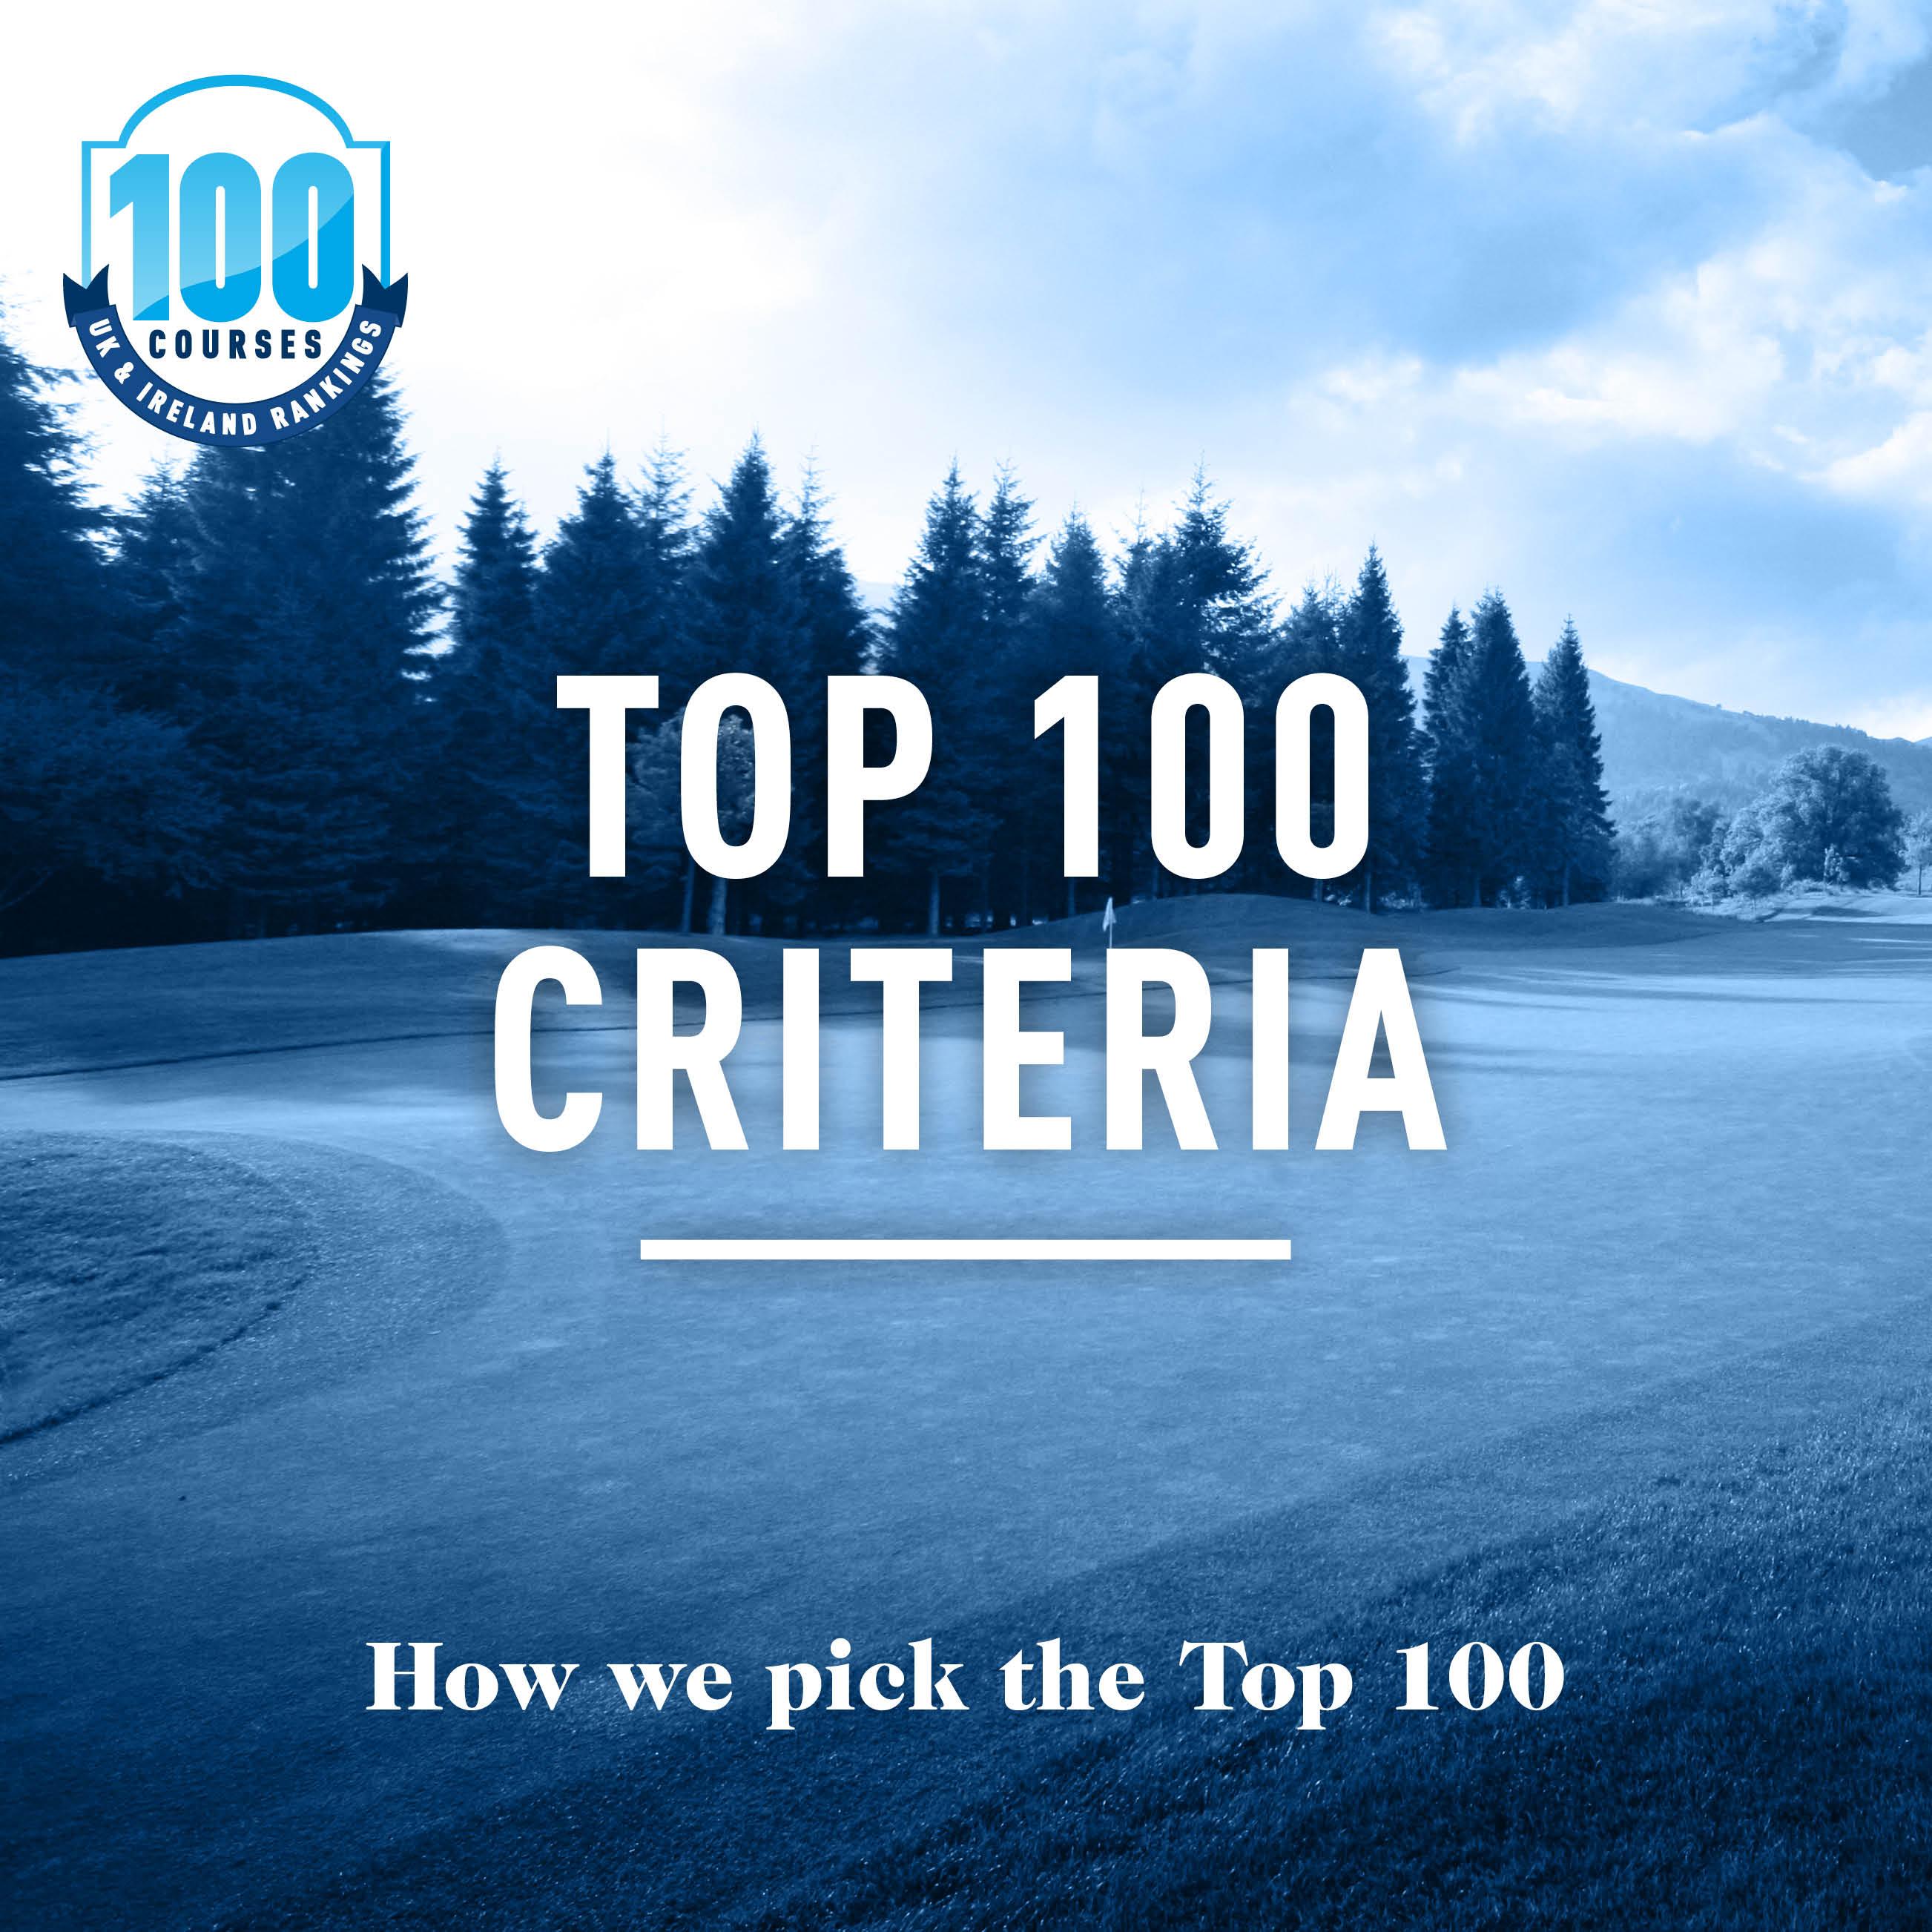 Top 100 Criteria